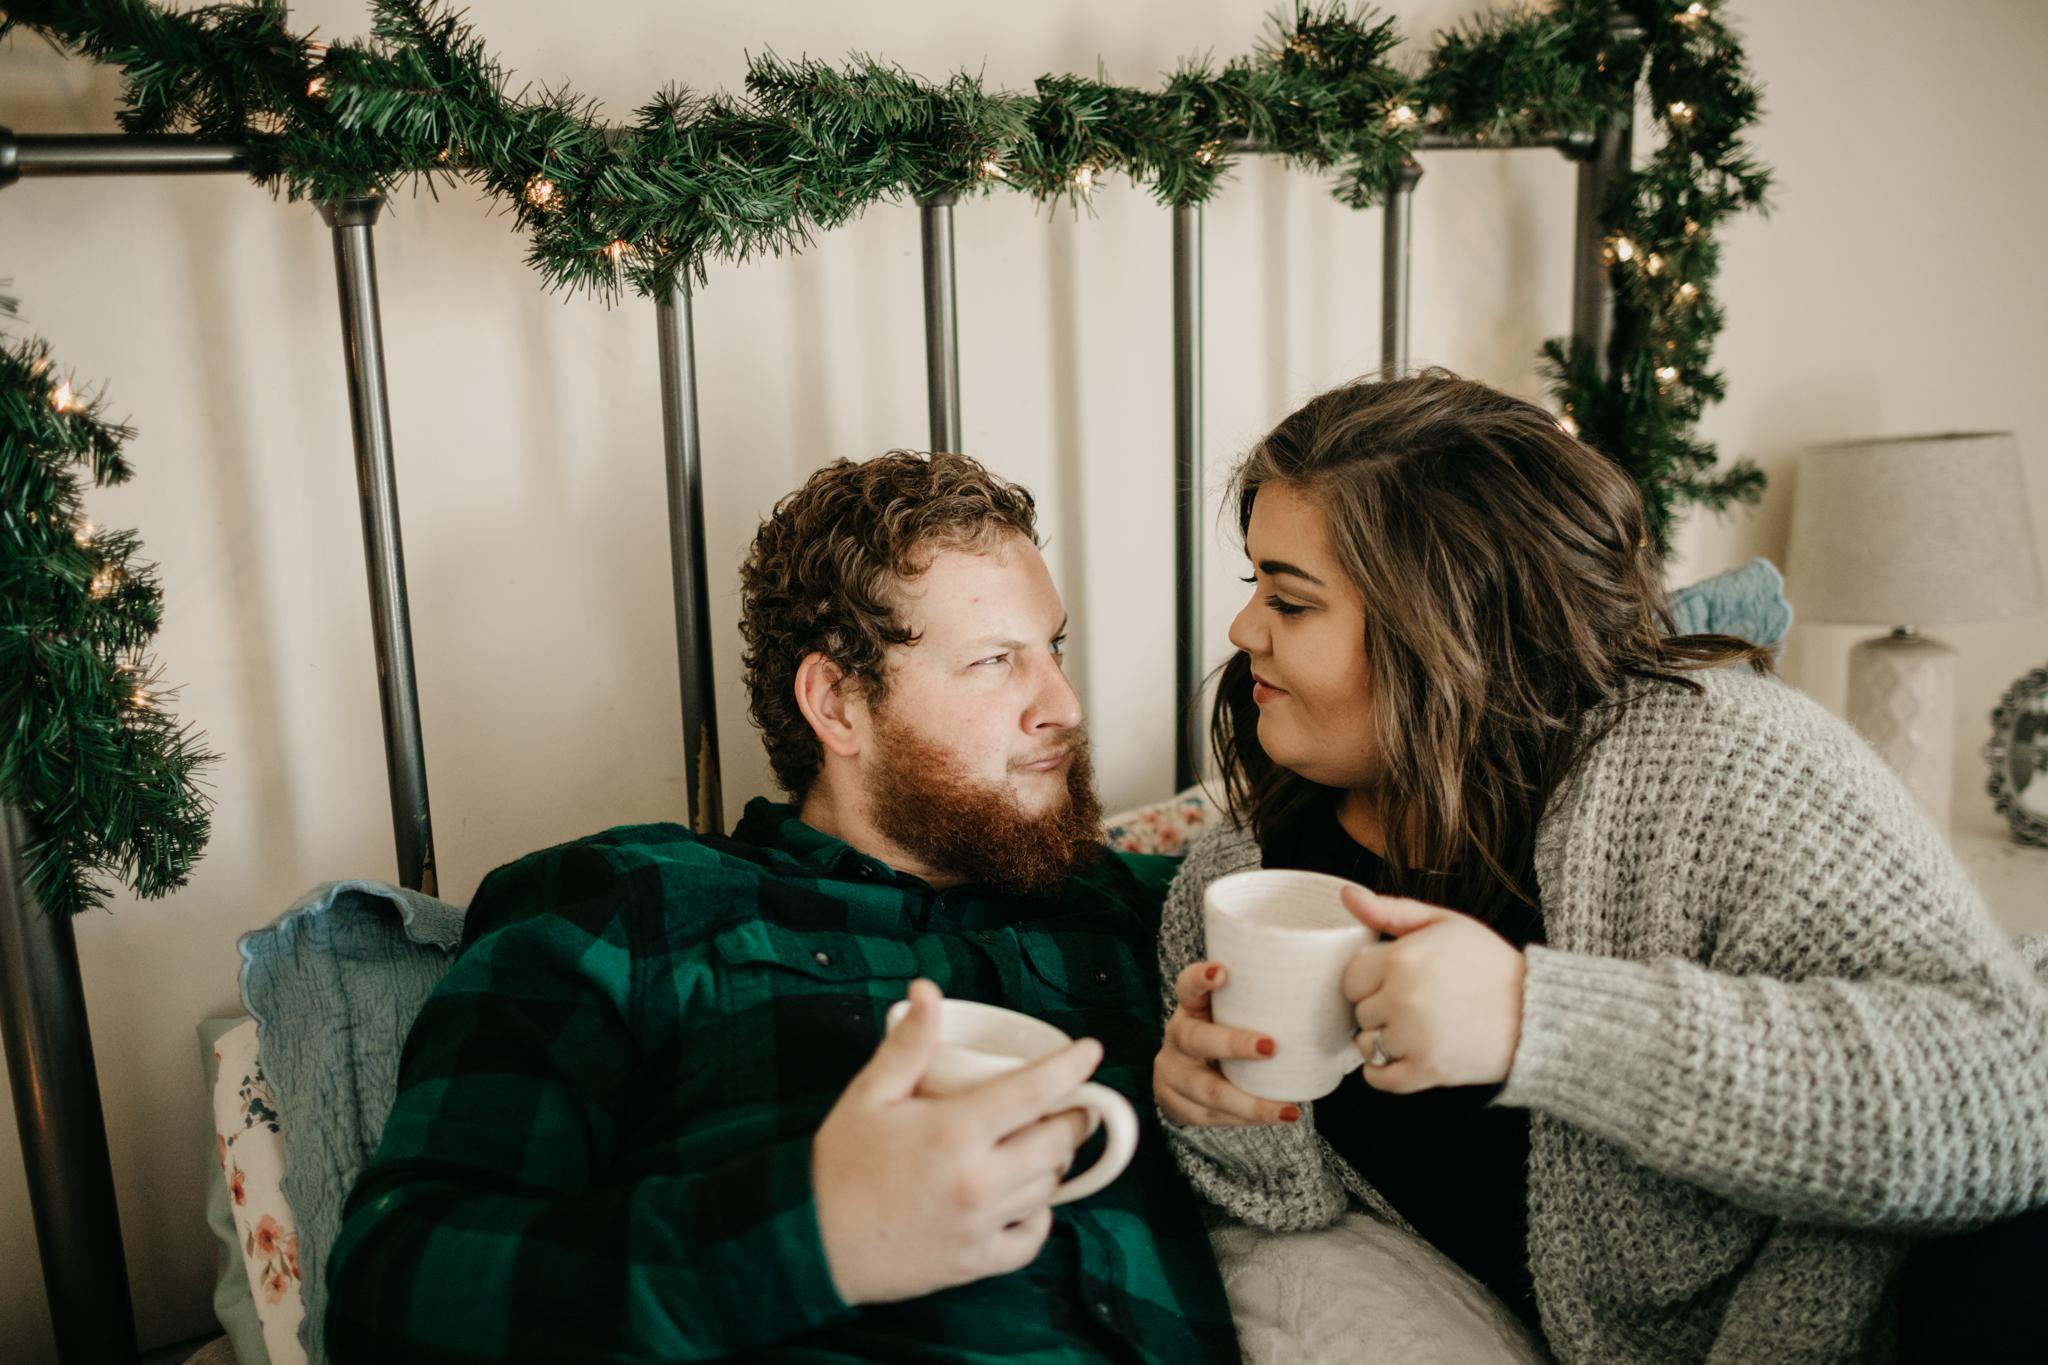 billie-shaye-style-photography-www.billieshayestyle.com-lifestyle-couple-christmas-cuddle-session-nashville-tennessee-8525.jpg